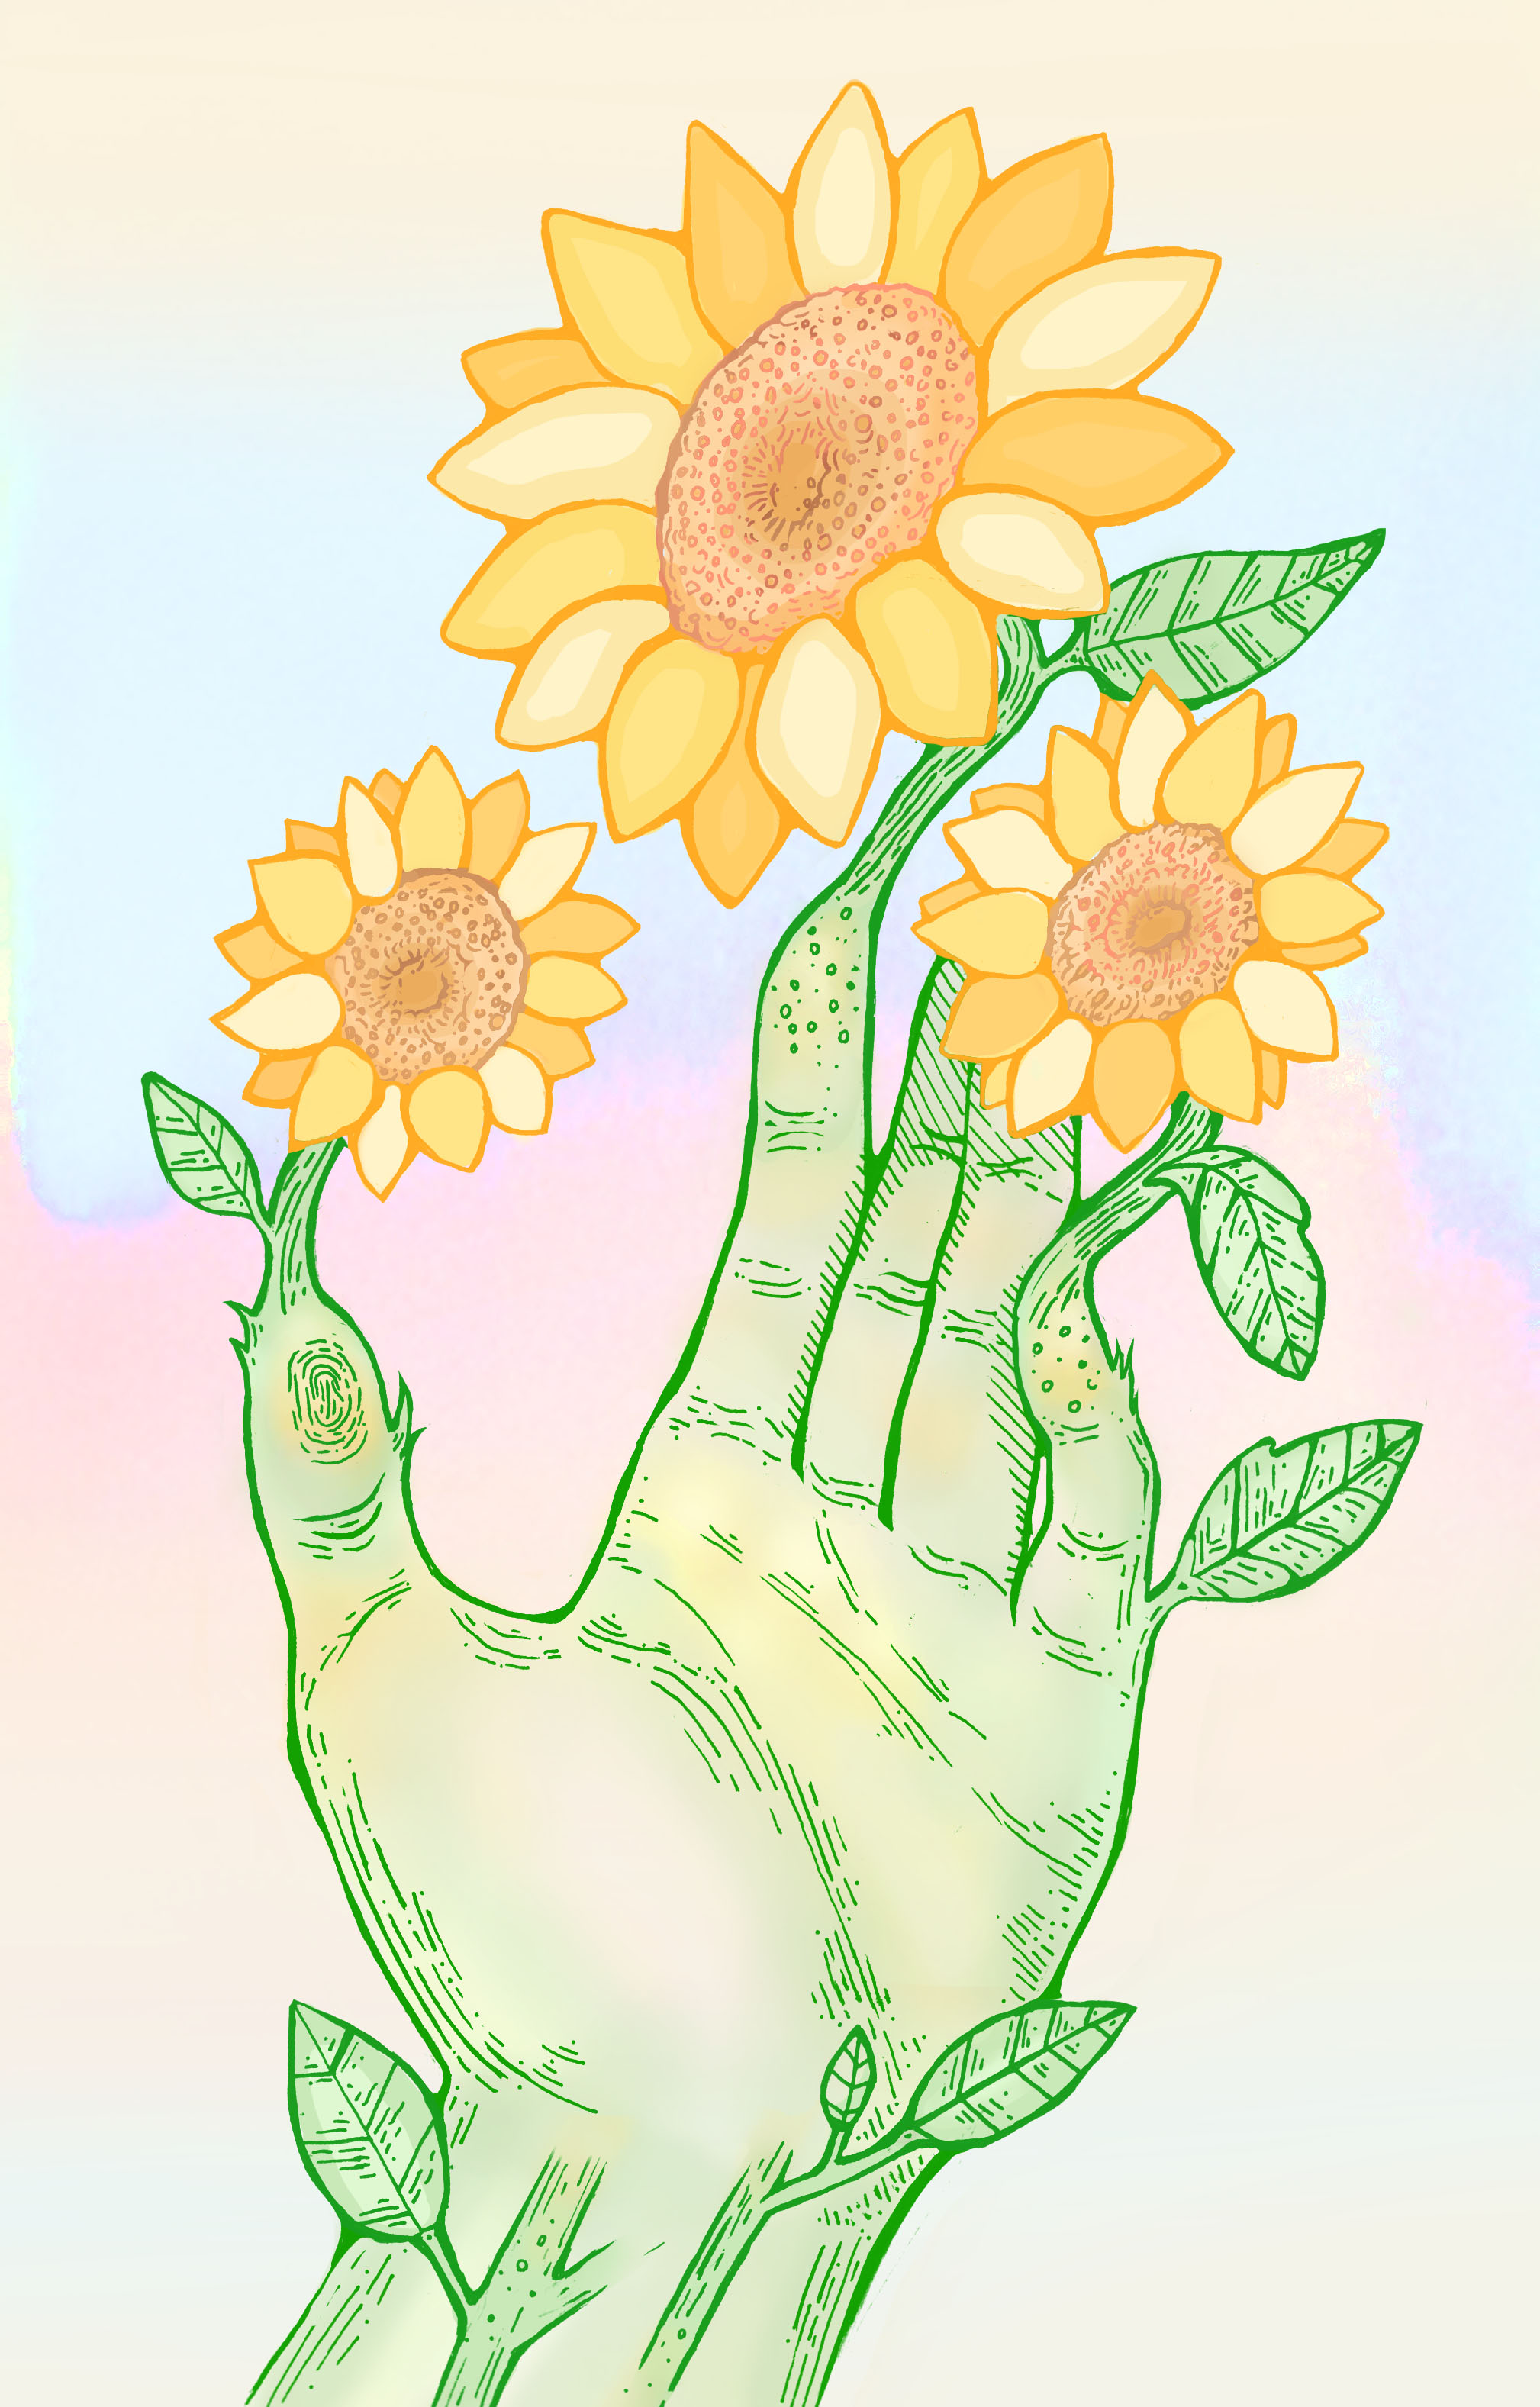 sunflowersisnta1.jpg